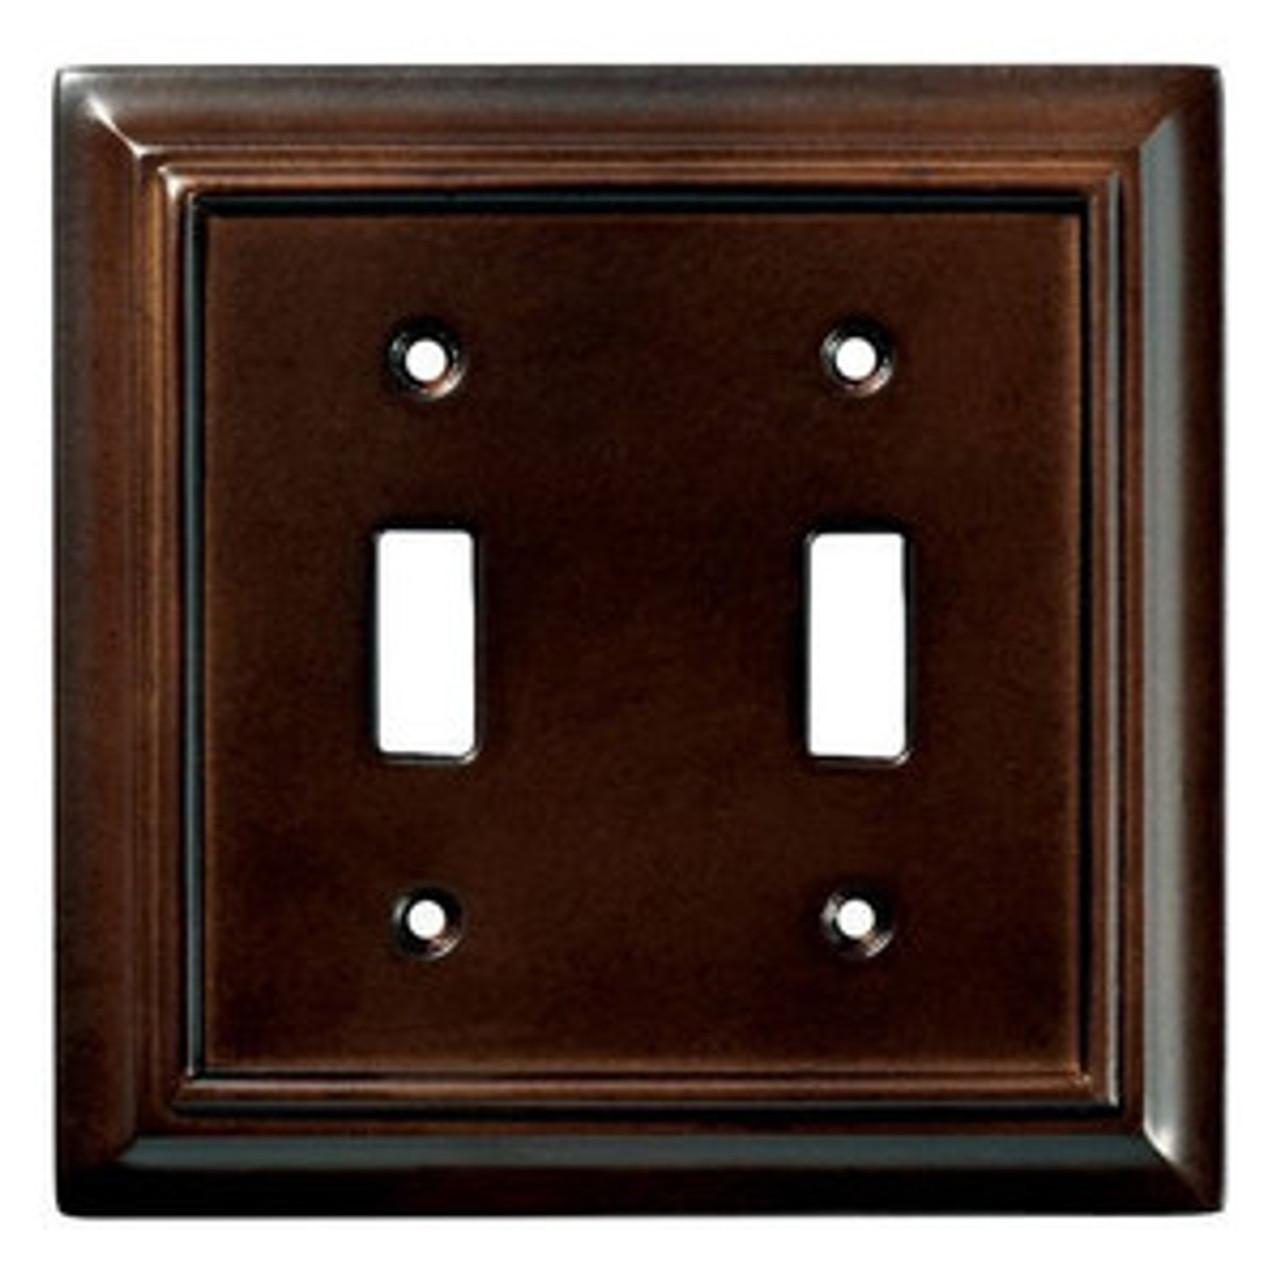 085-03-1462  Architect Espresso Double Switch Combo Cover Plate